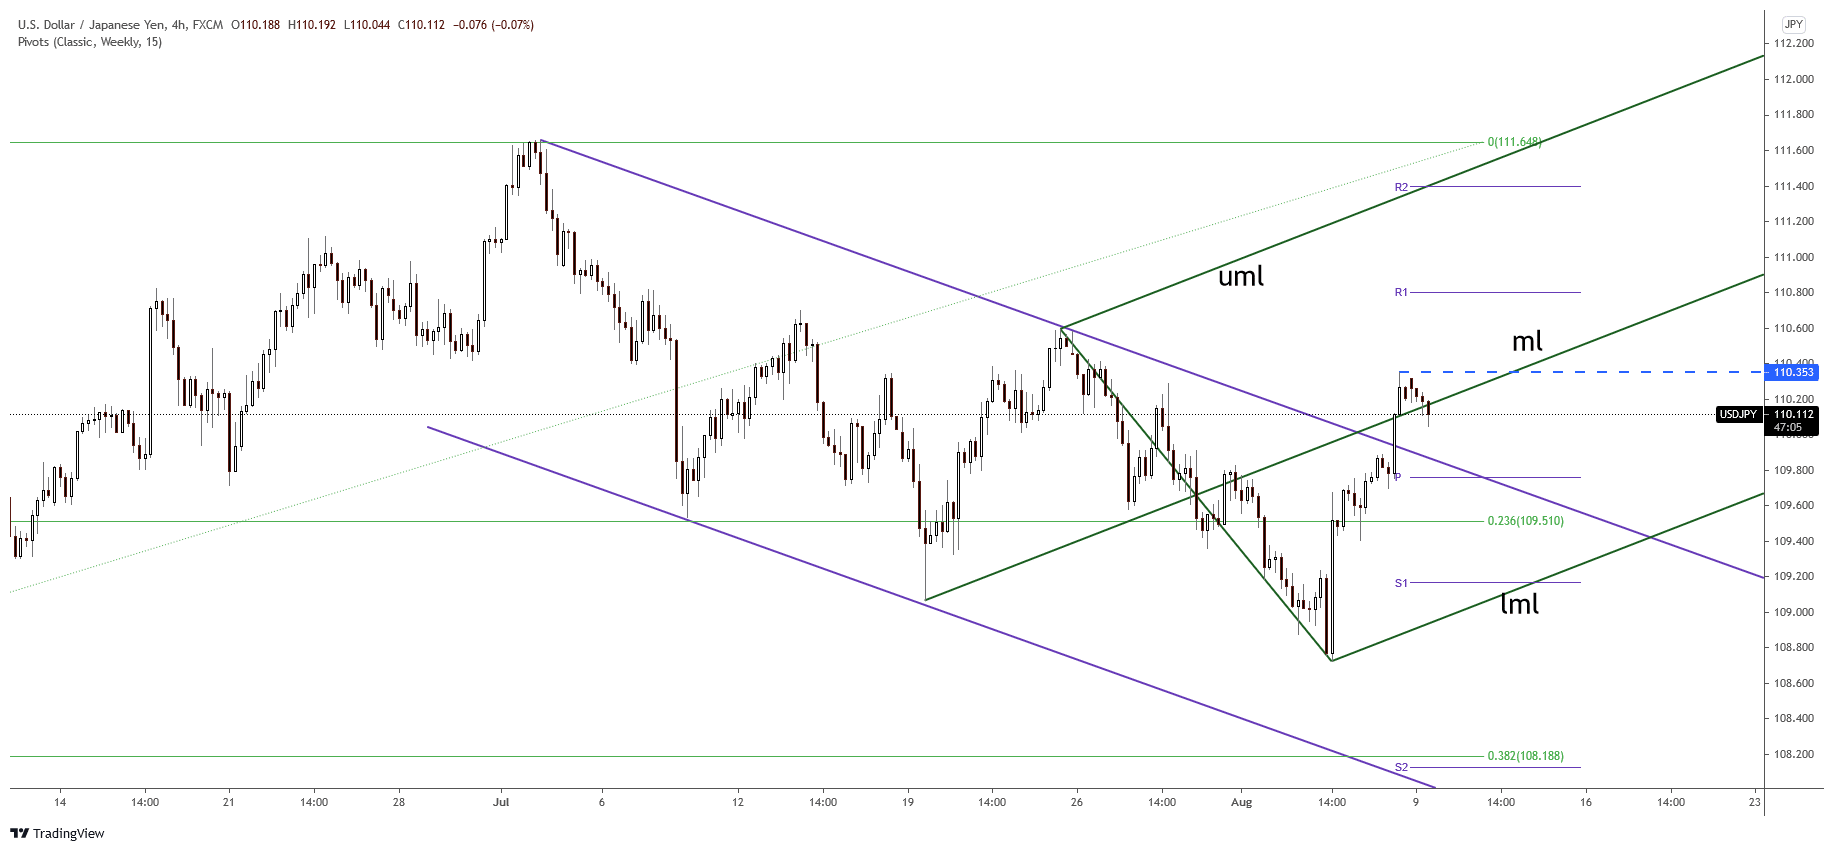 USD/JPY 4-hour price chart